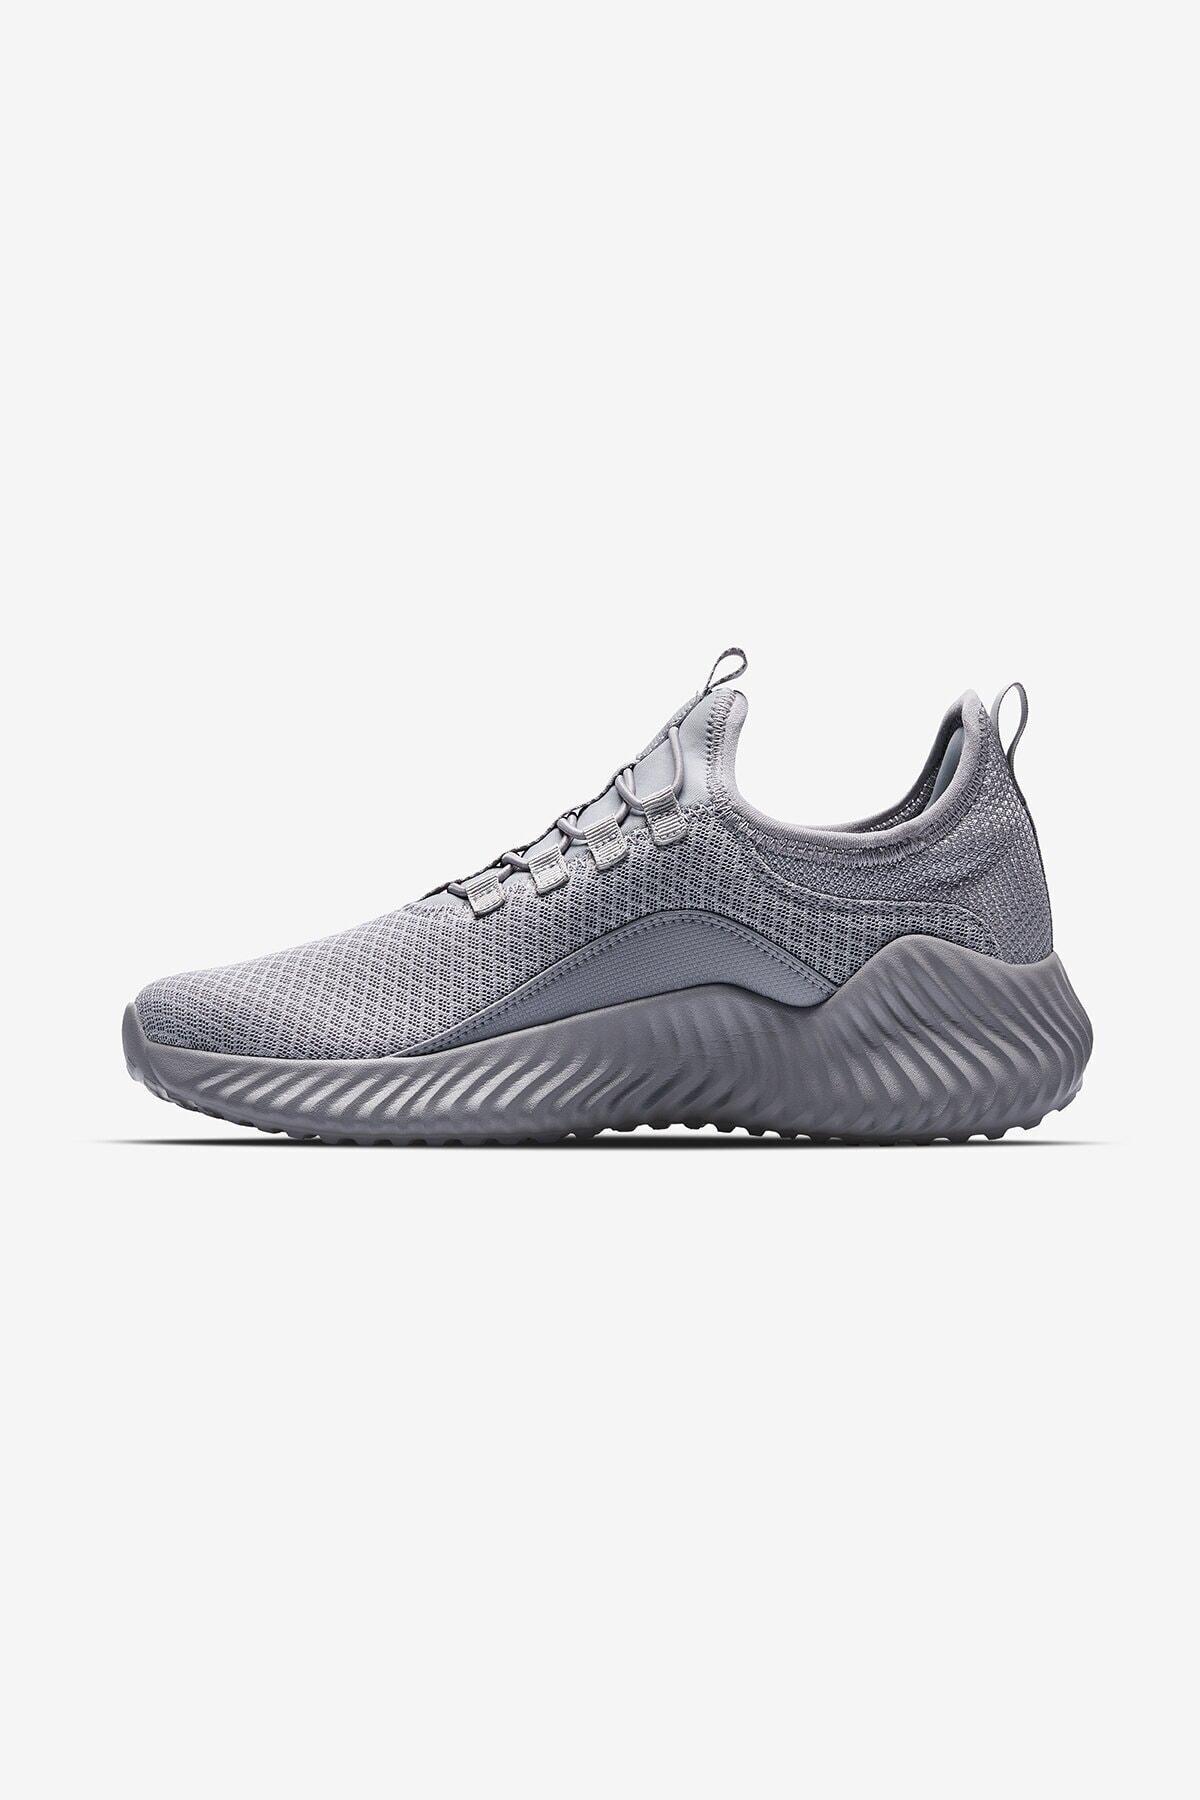 Lescon Ayakkabı Grs 20yz Hellıum Nano/gri/38 2